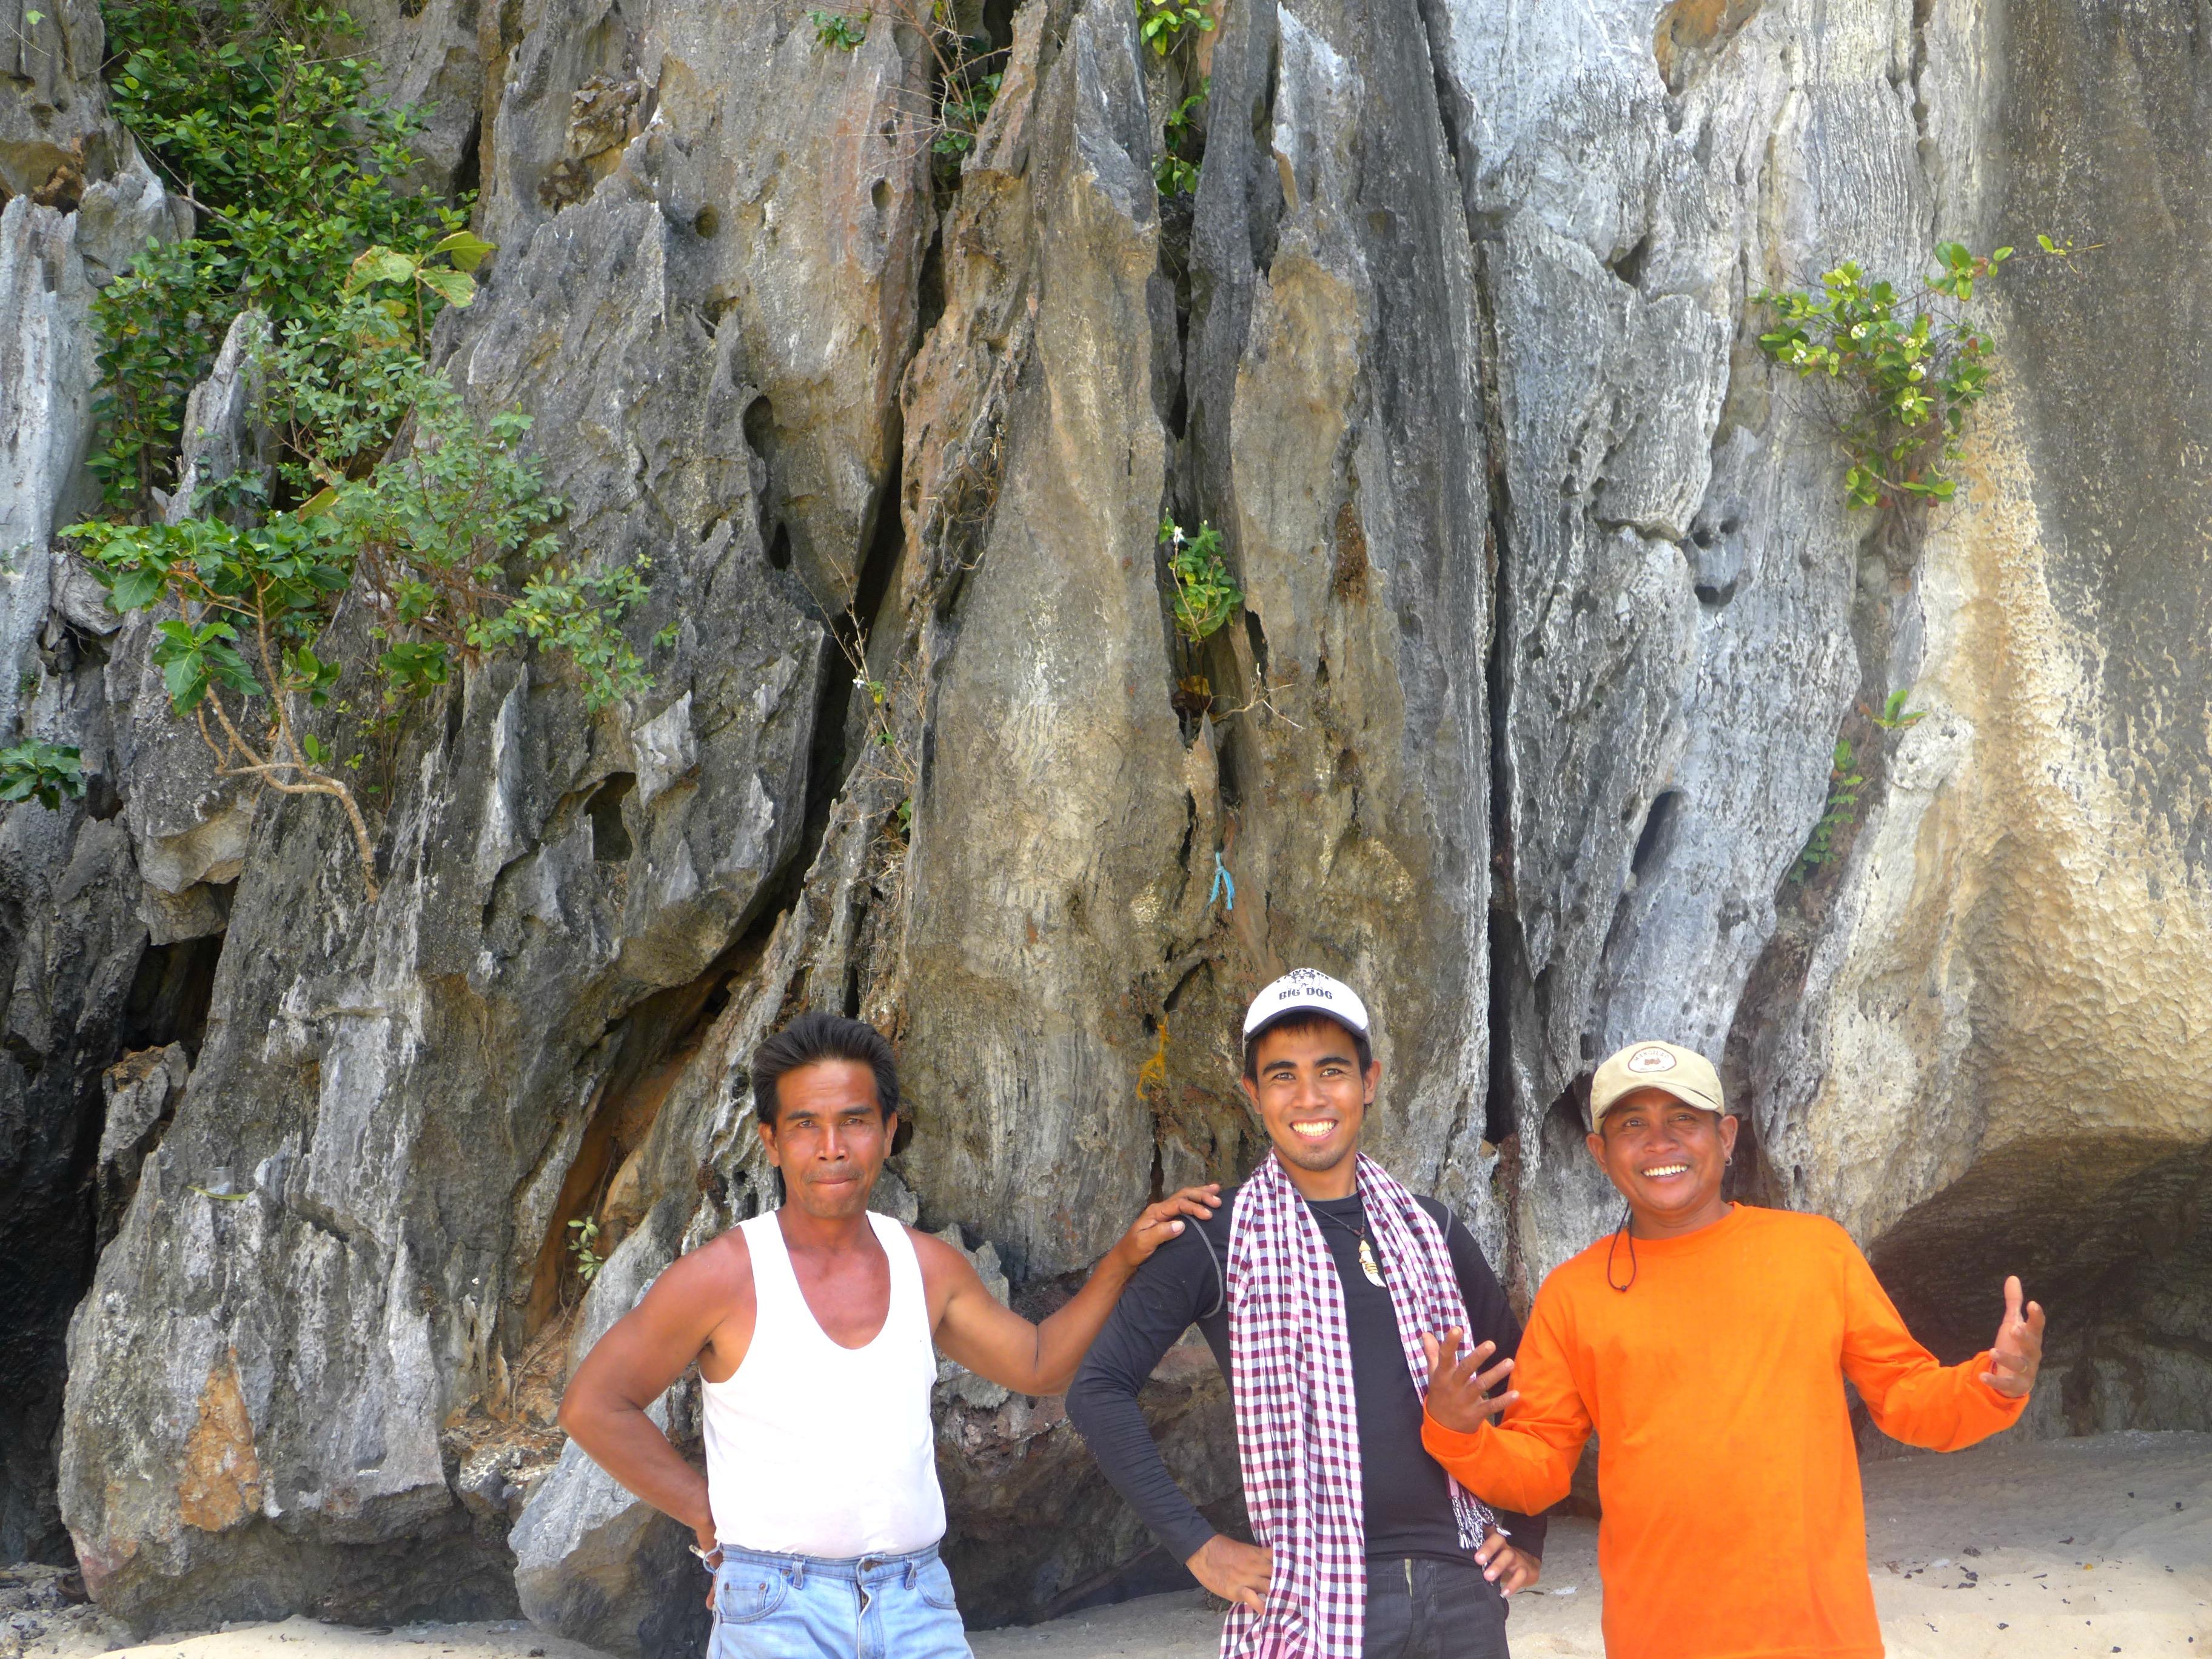 D.I.Y. El Nido, Palawan; D.I.Y. Palawan; El Nido Tour C; El Nido budget travel